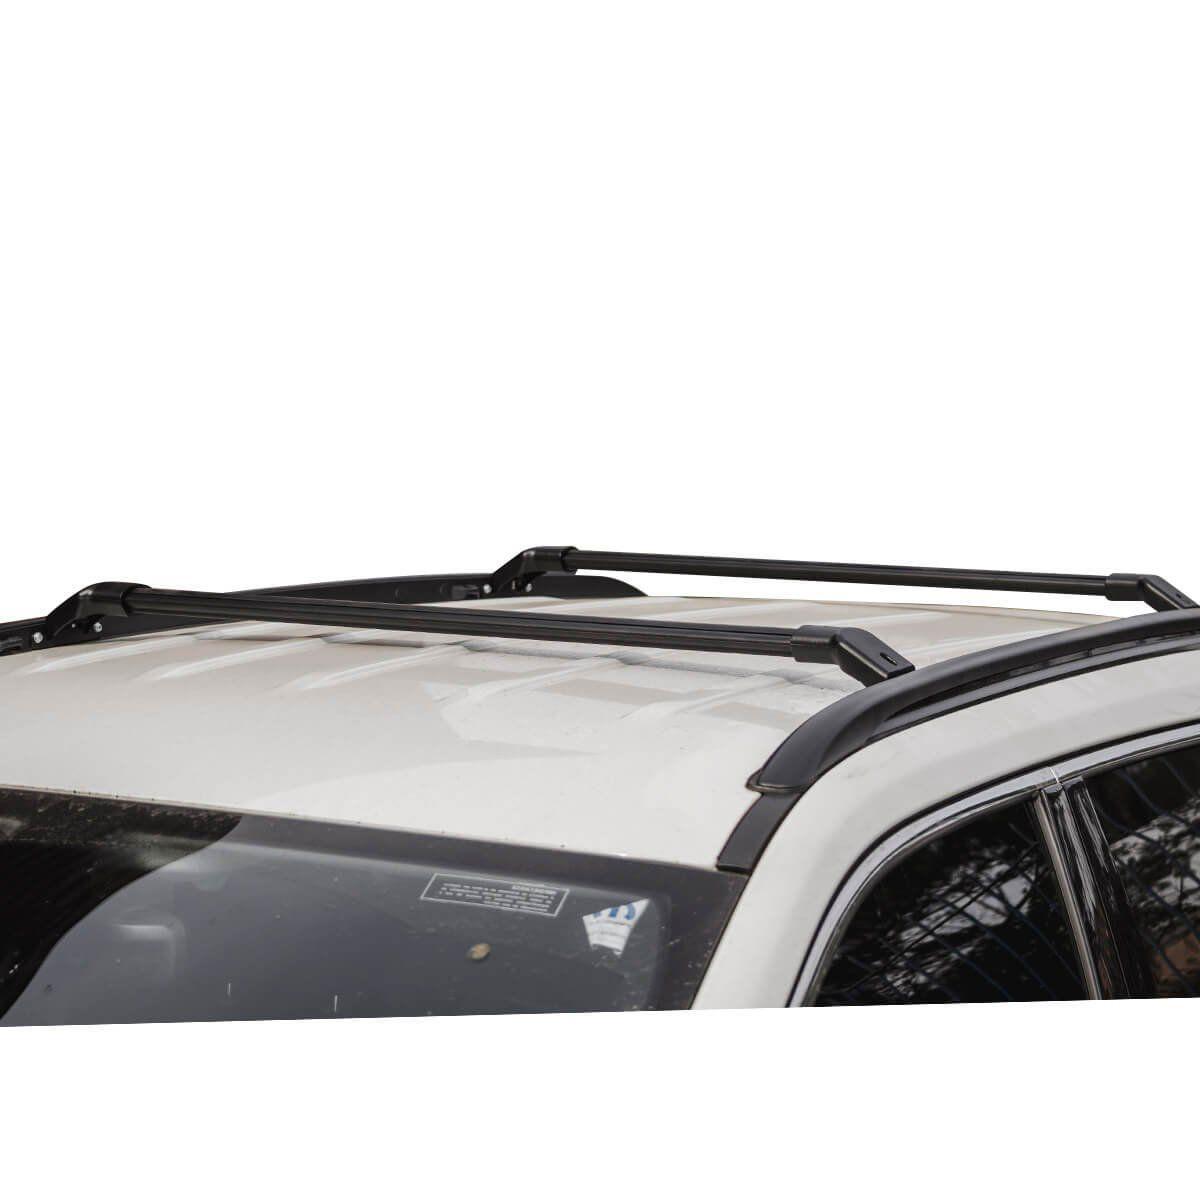 Travessa rack de teto larga preta Jeep Compass 2017 a 2021